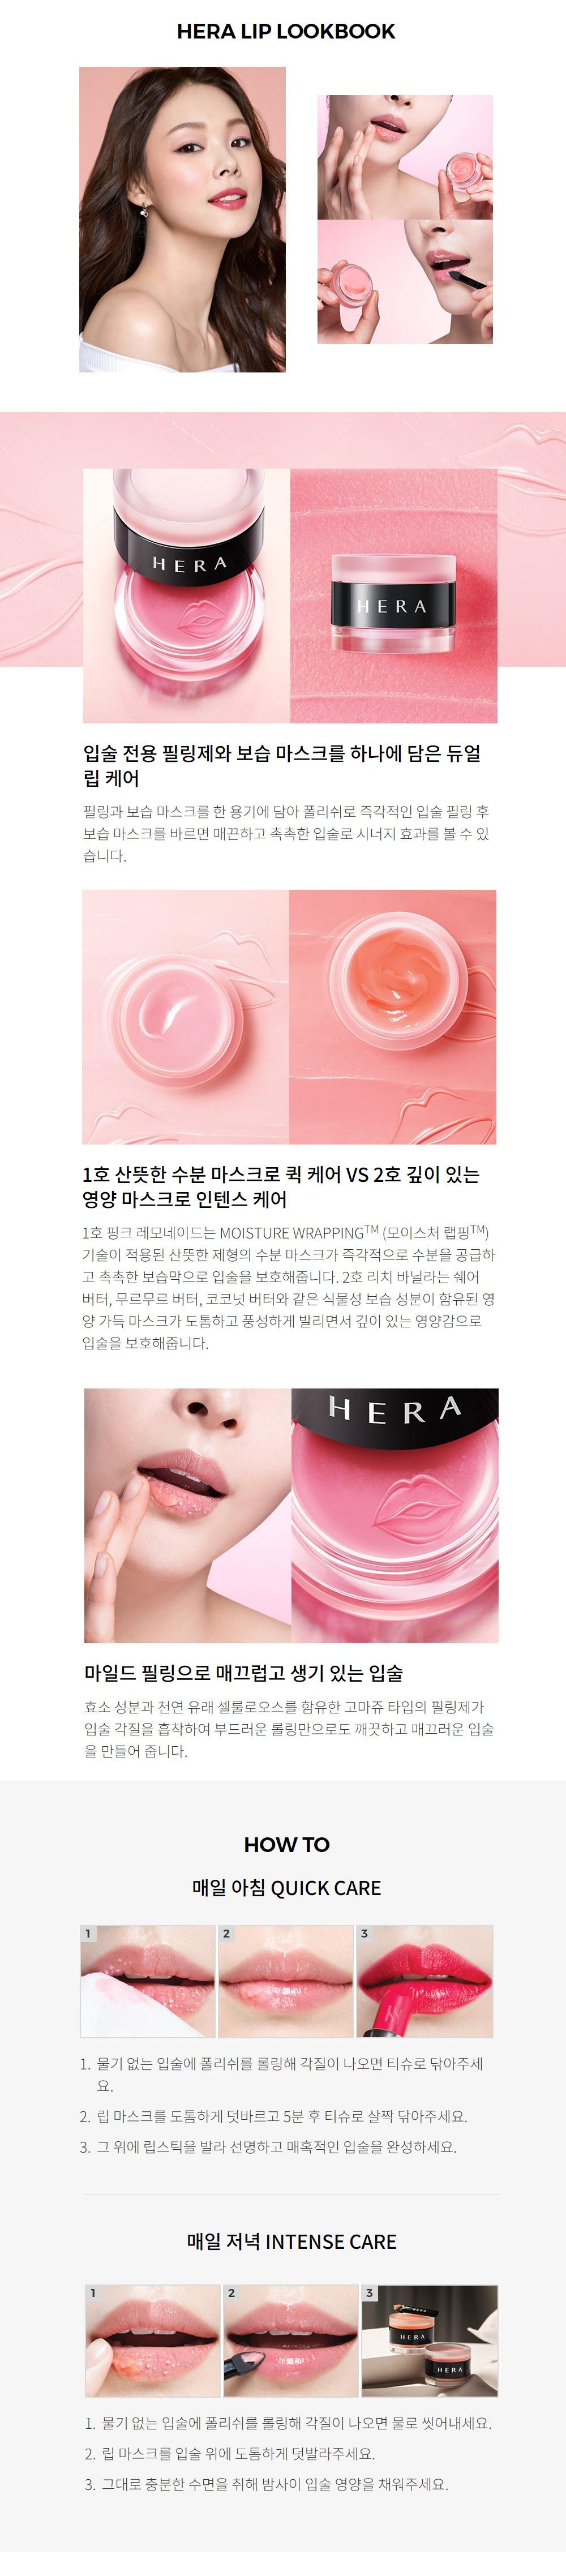 Hera Lip Polish And Mask korean cosmetic makeup product online shop malaysia hong kong australia1